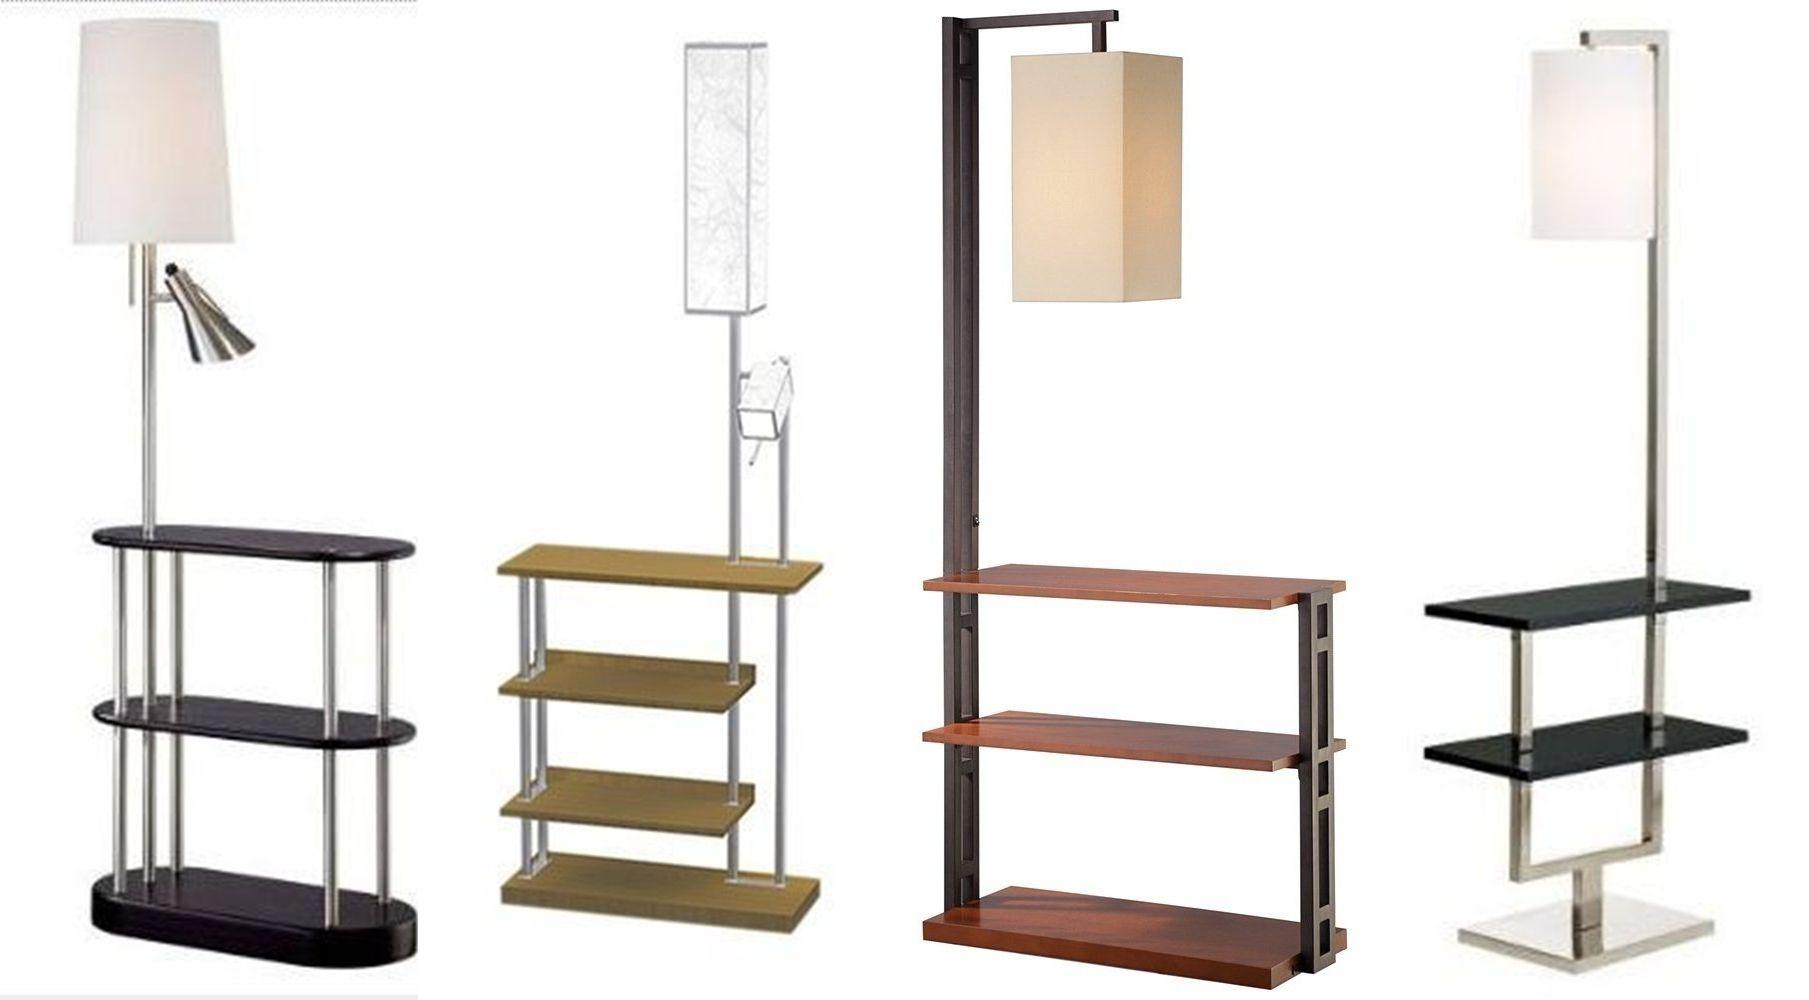 light reading deco shelf wood iron floor item industrial standing for room with home lamp shelves modern living tripod